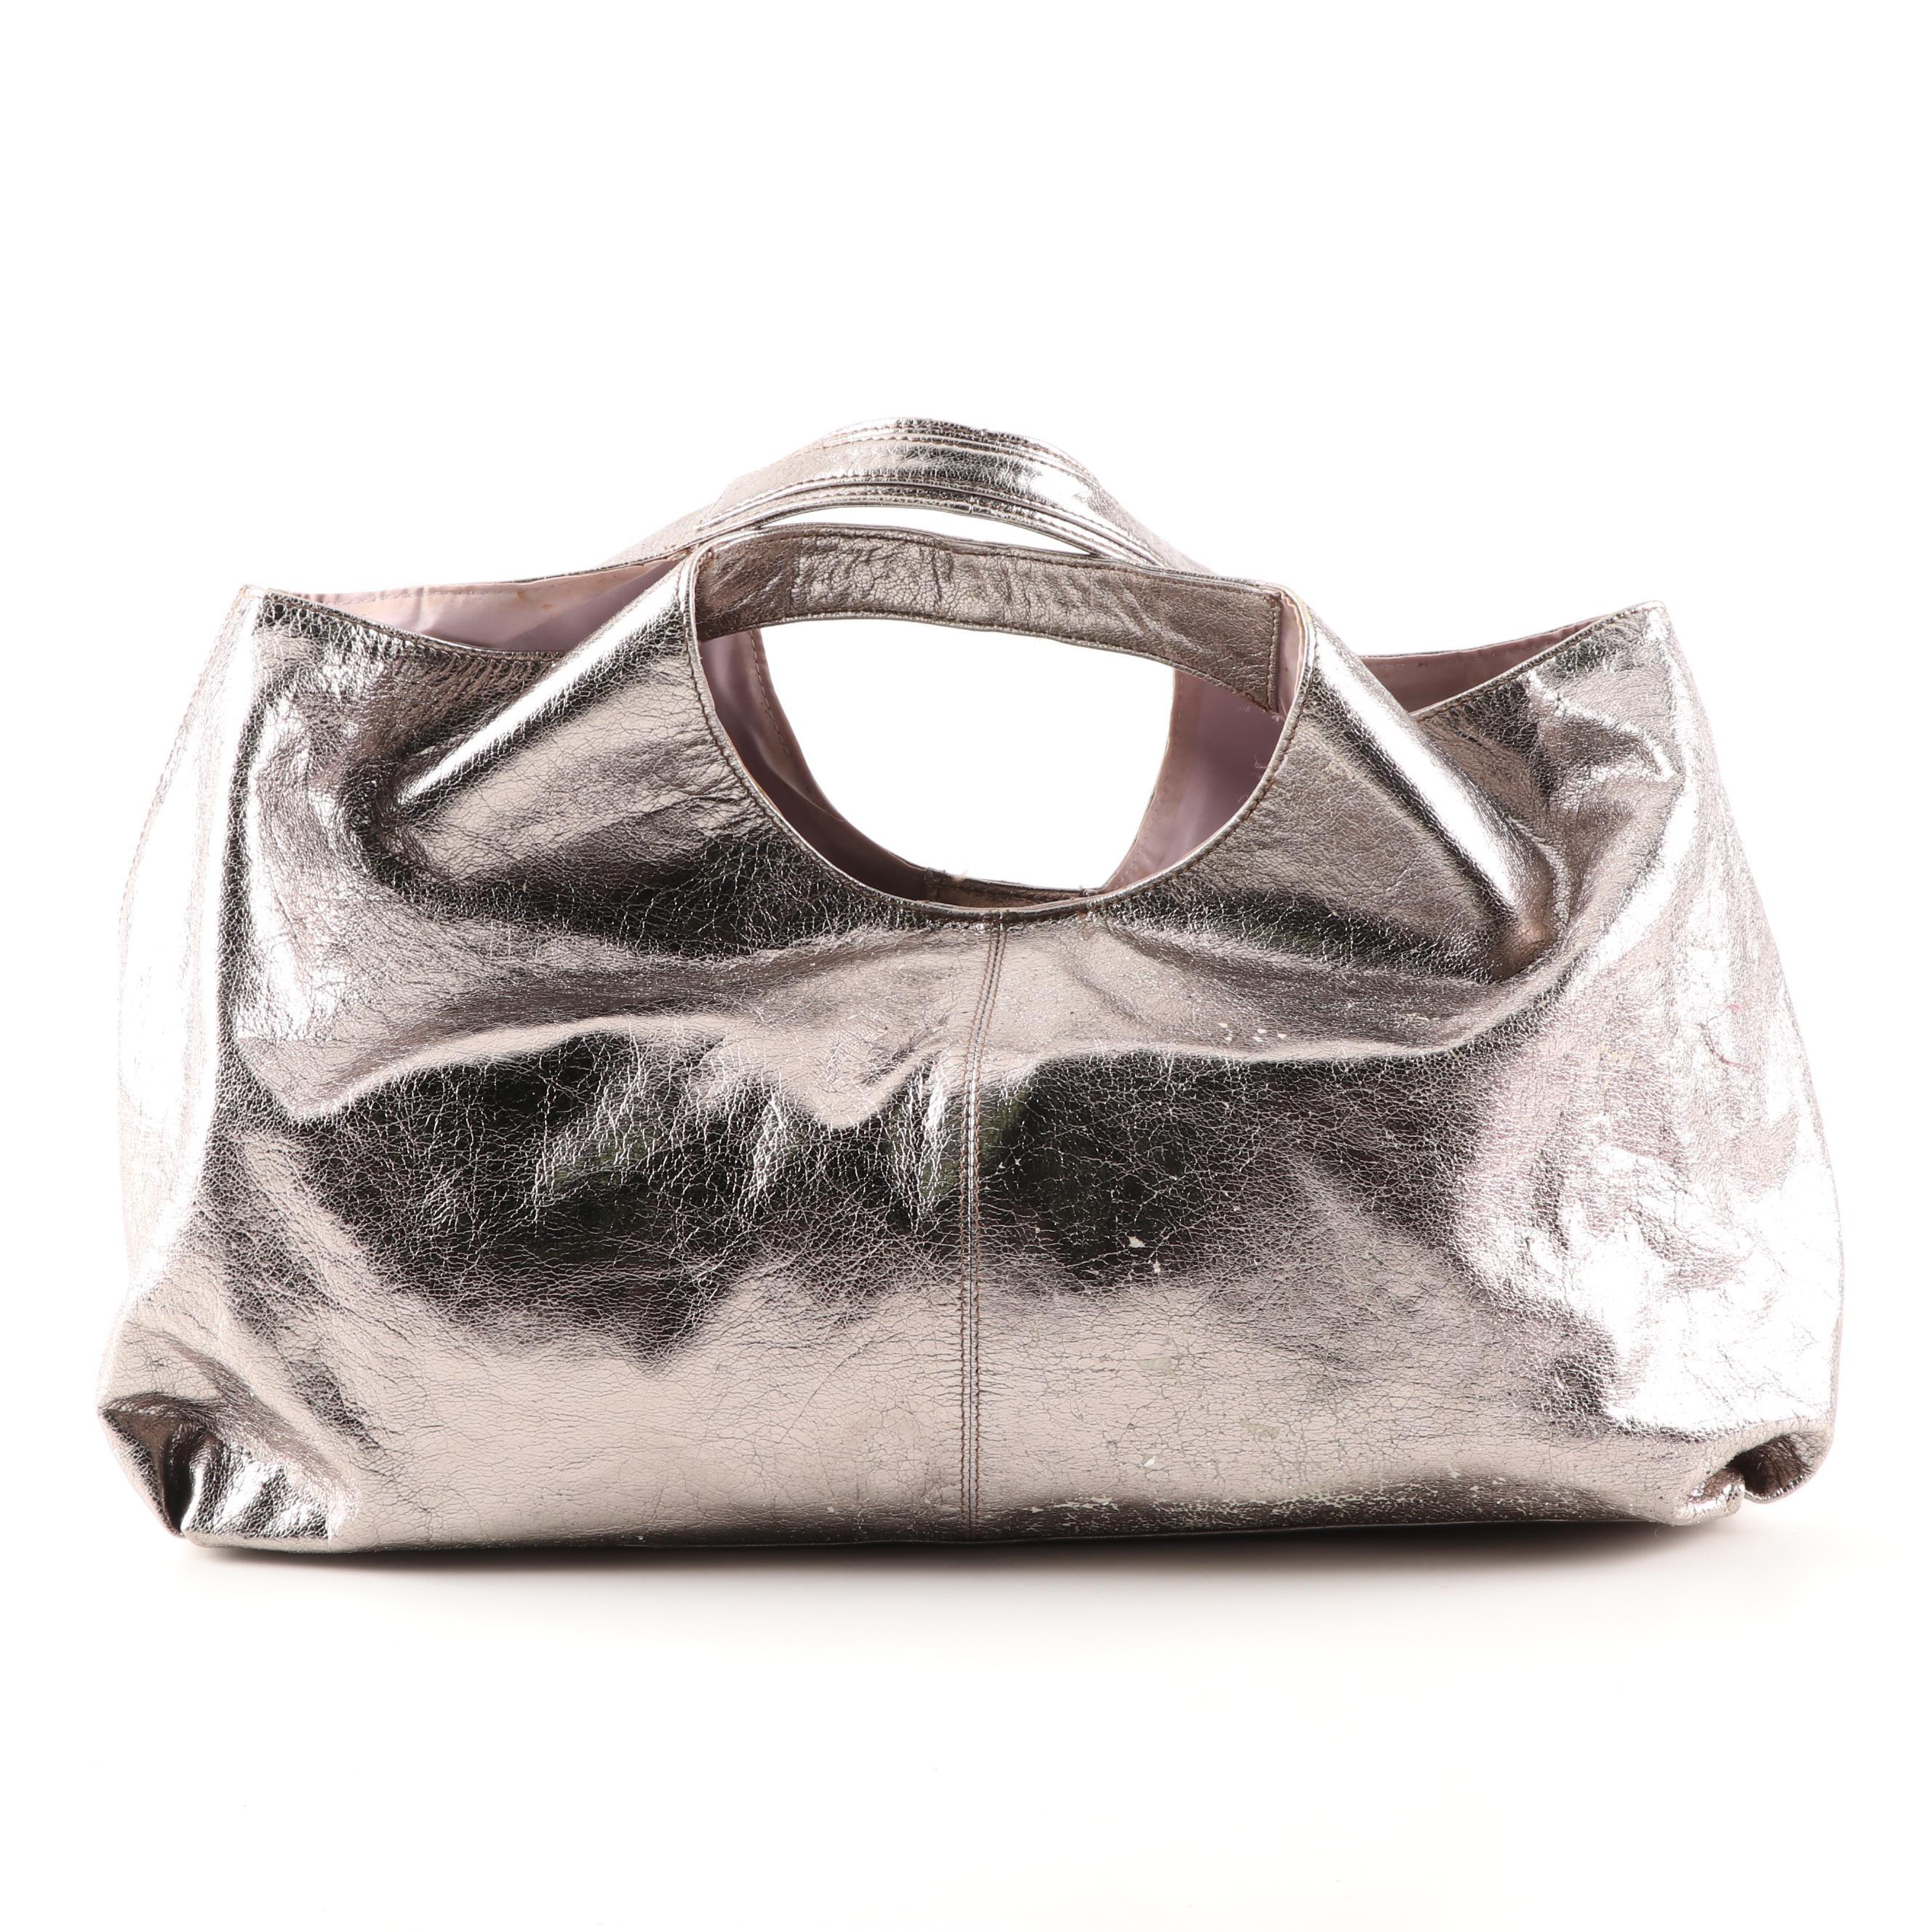 Tano New York Metallic Leather Satchel